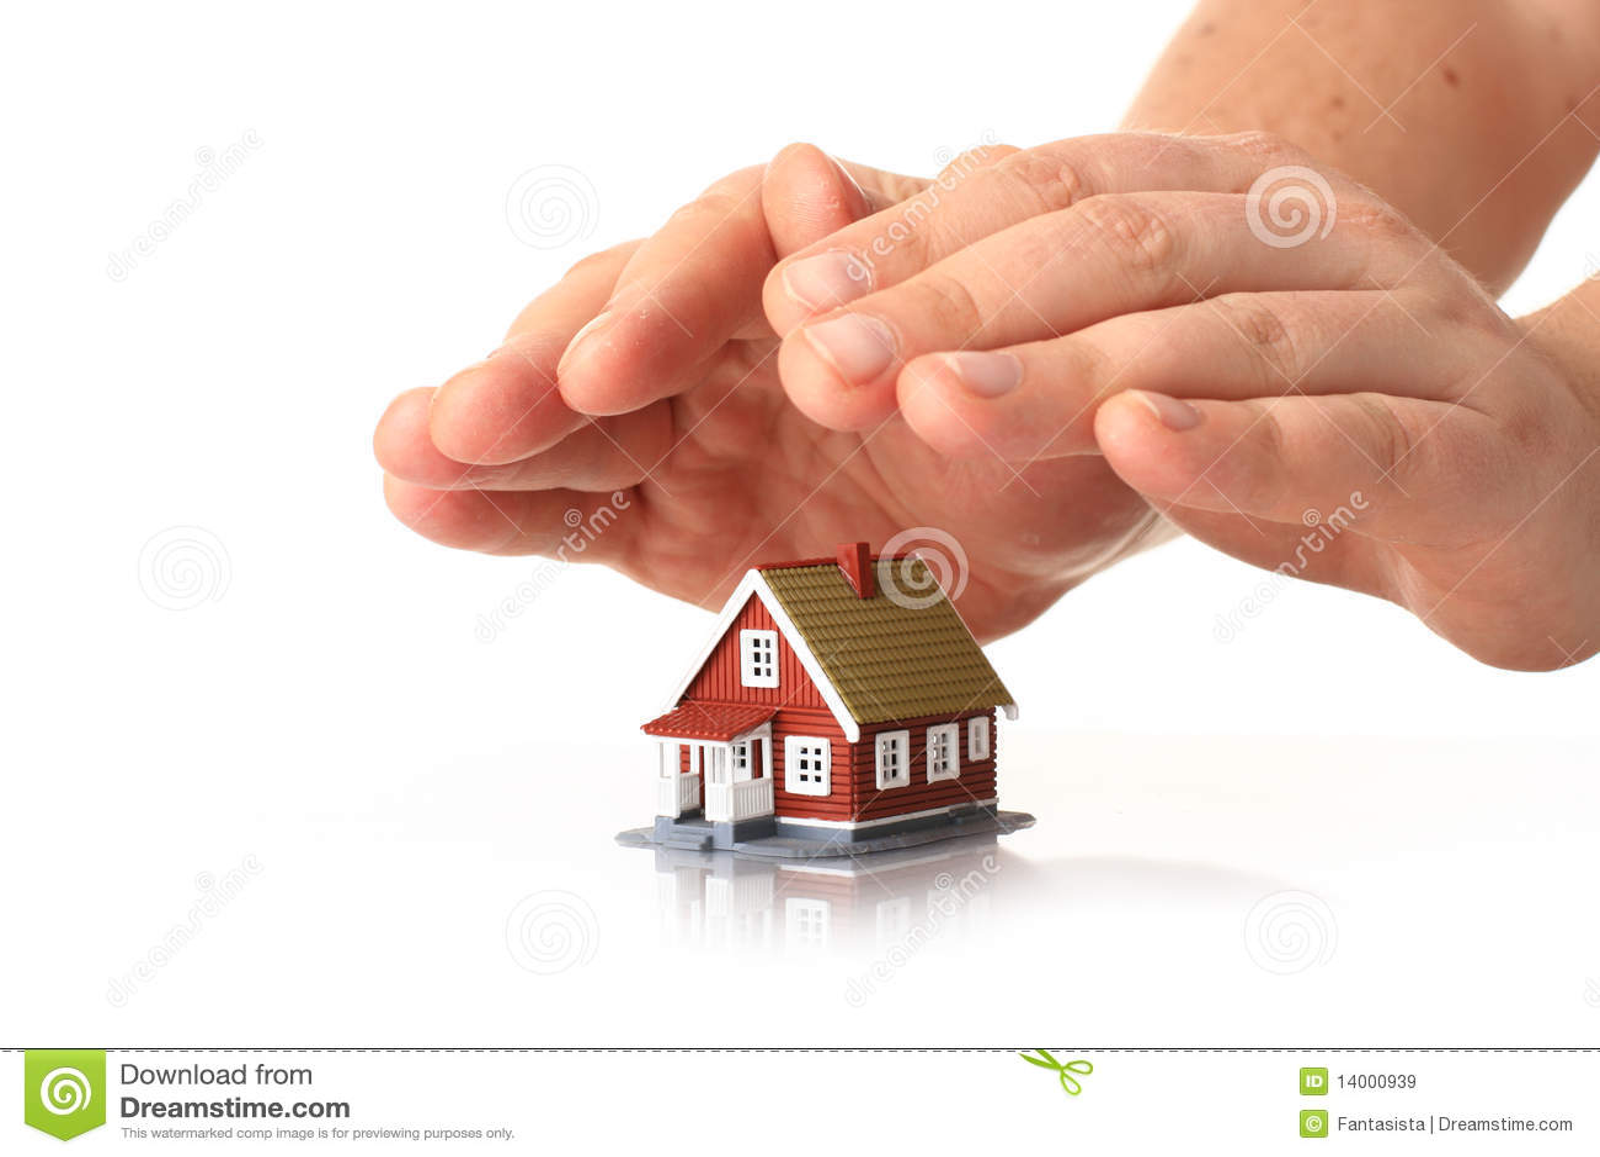 House insurance.